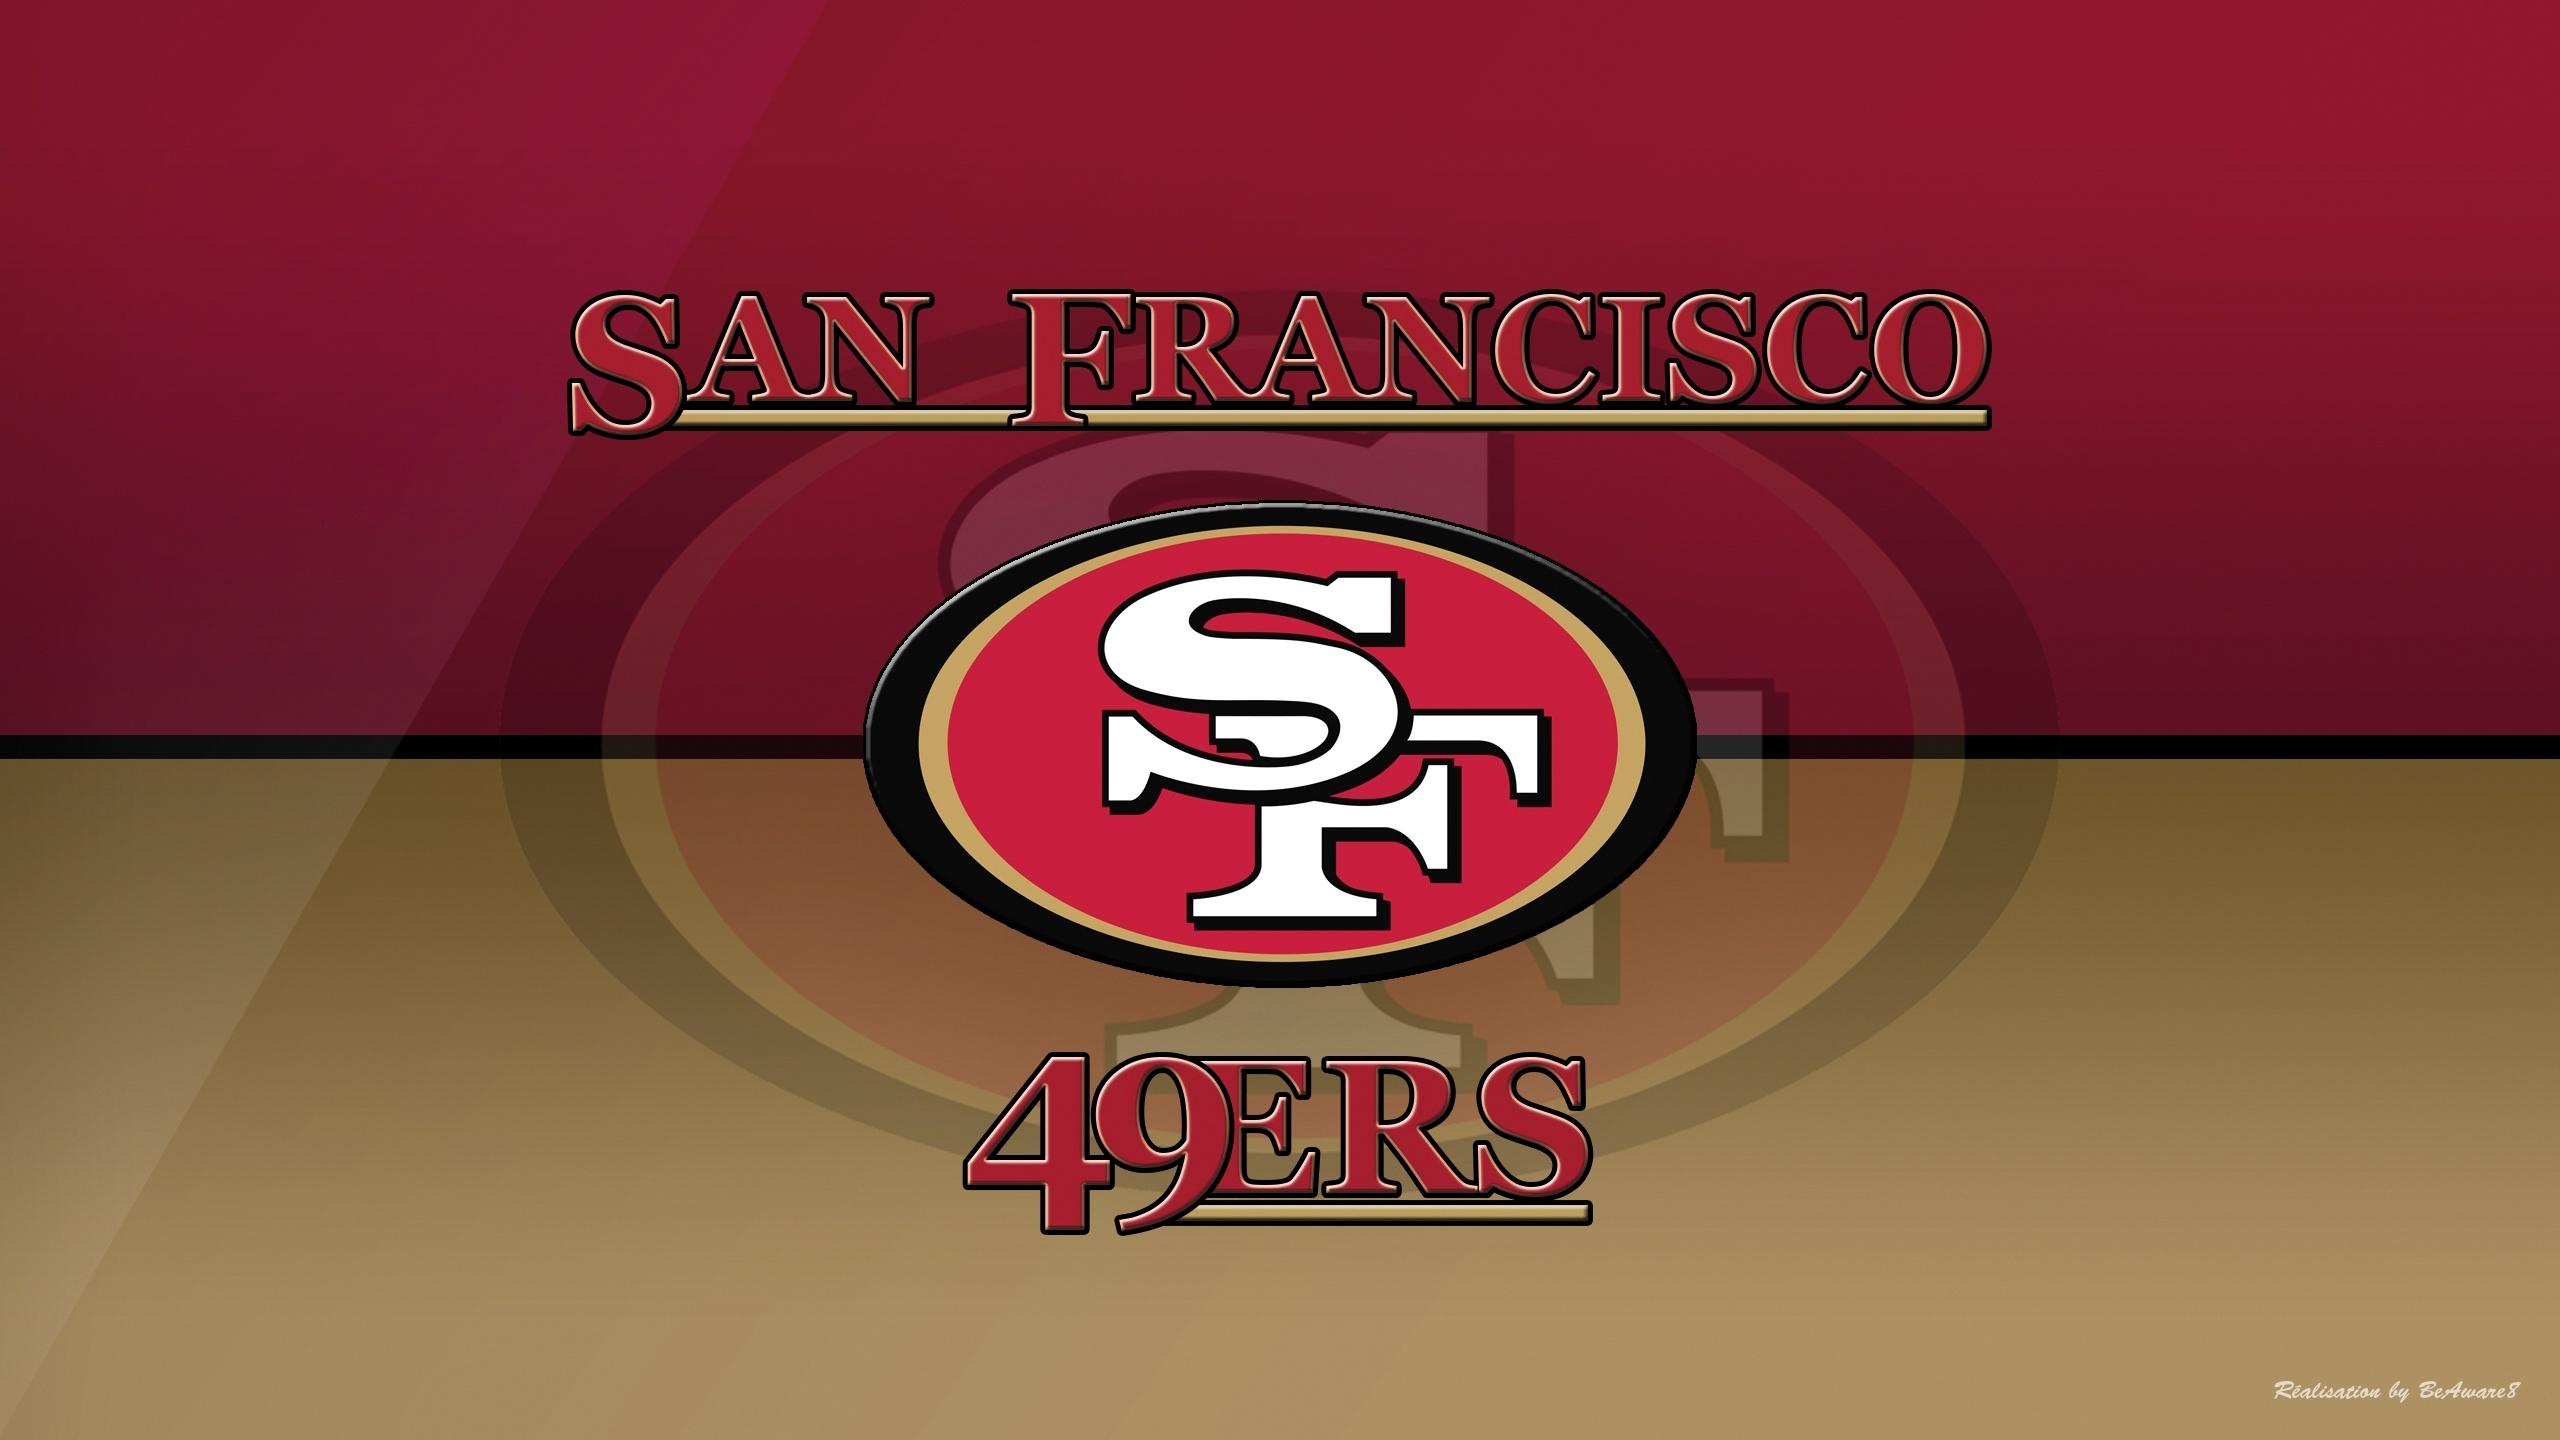 san francisco 49ers logo wallpaper - 1318489